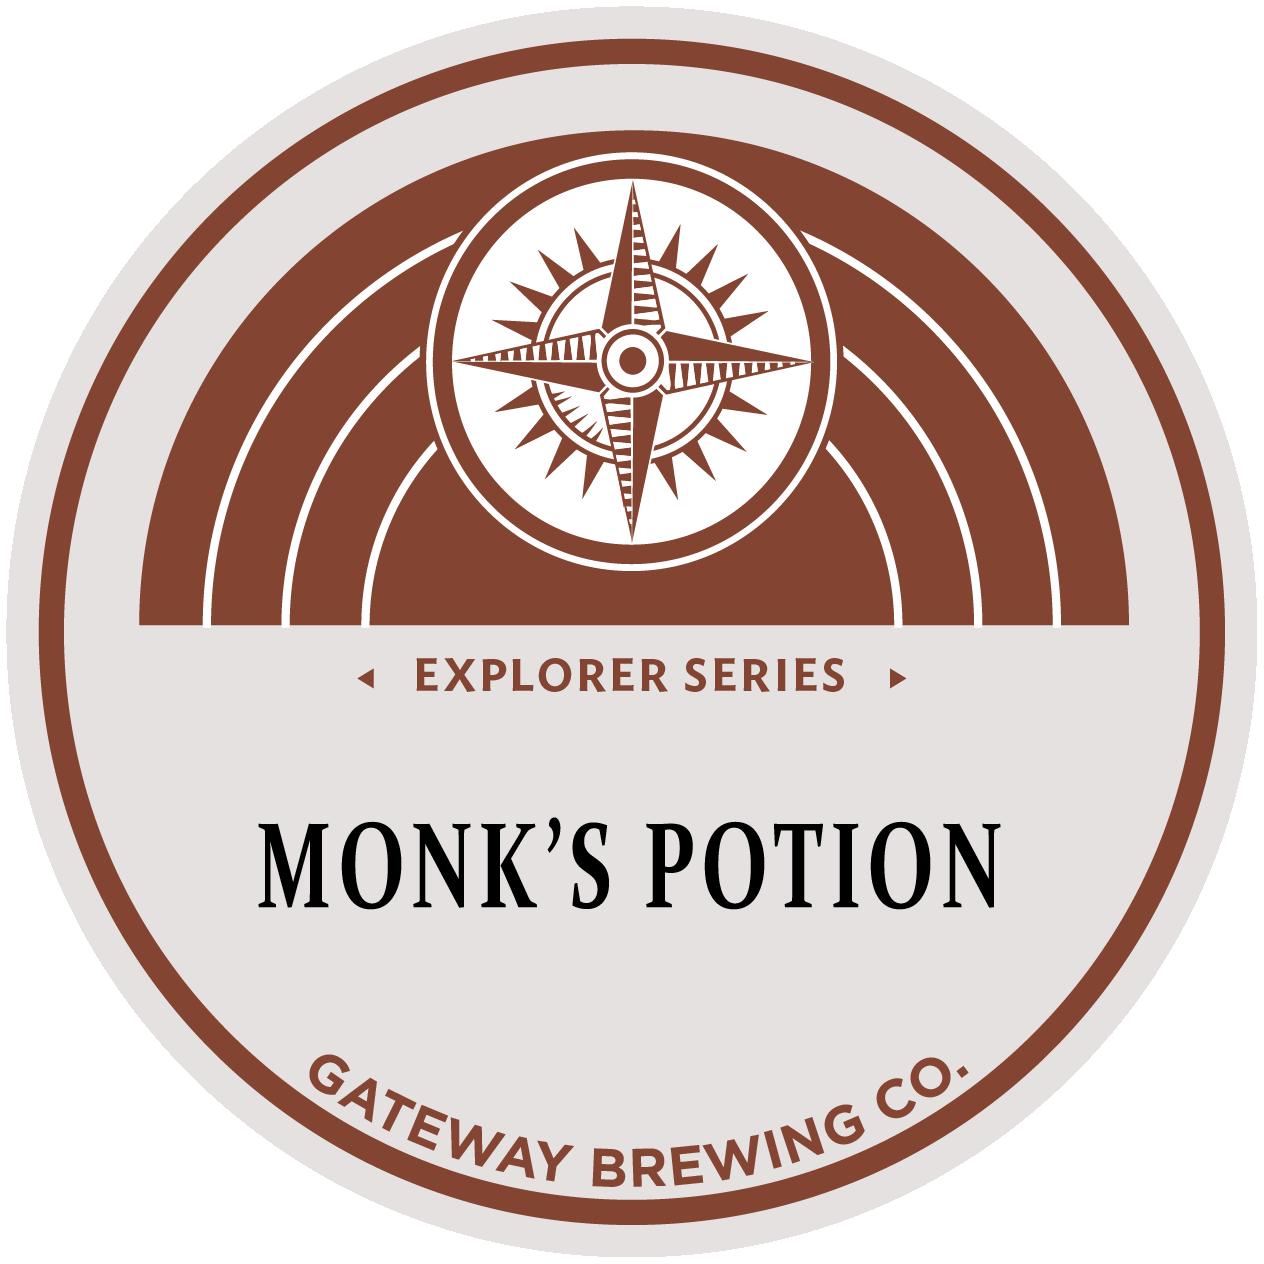 Monk's Potion